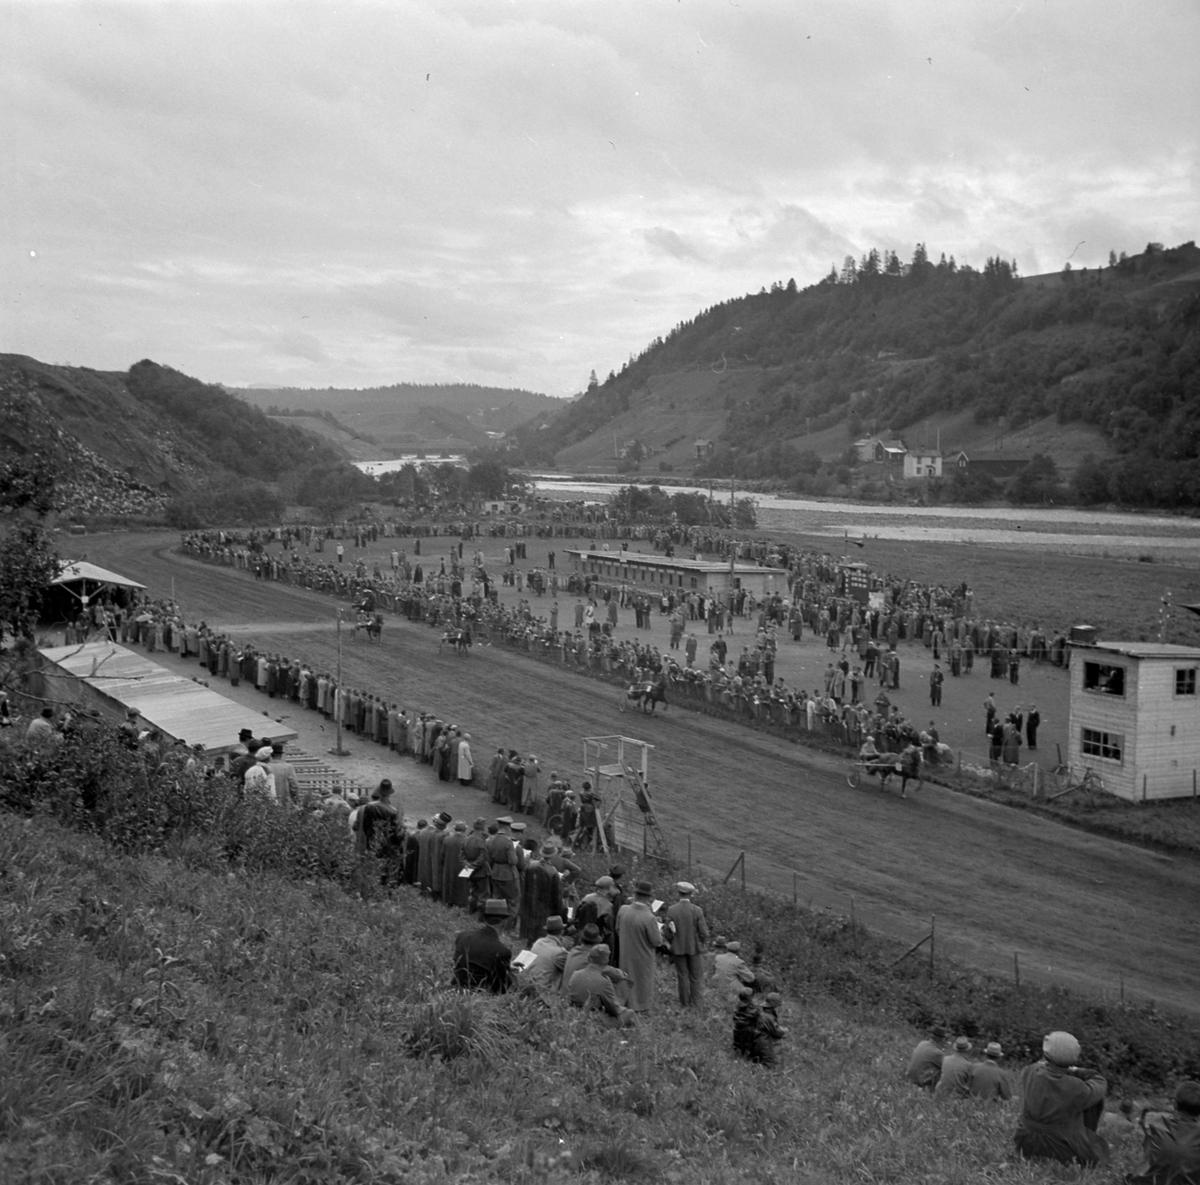 Tempe travbane på Valøya